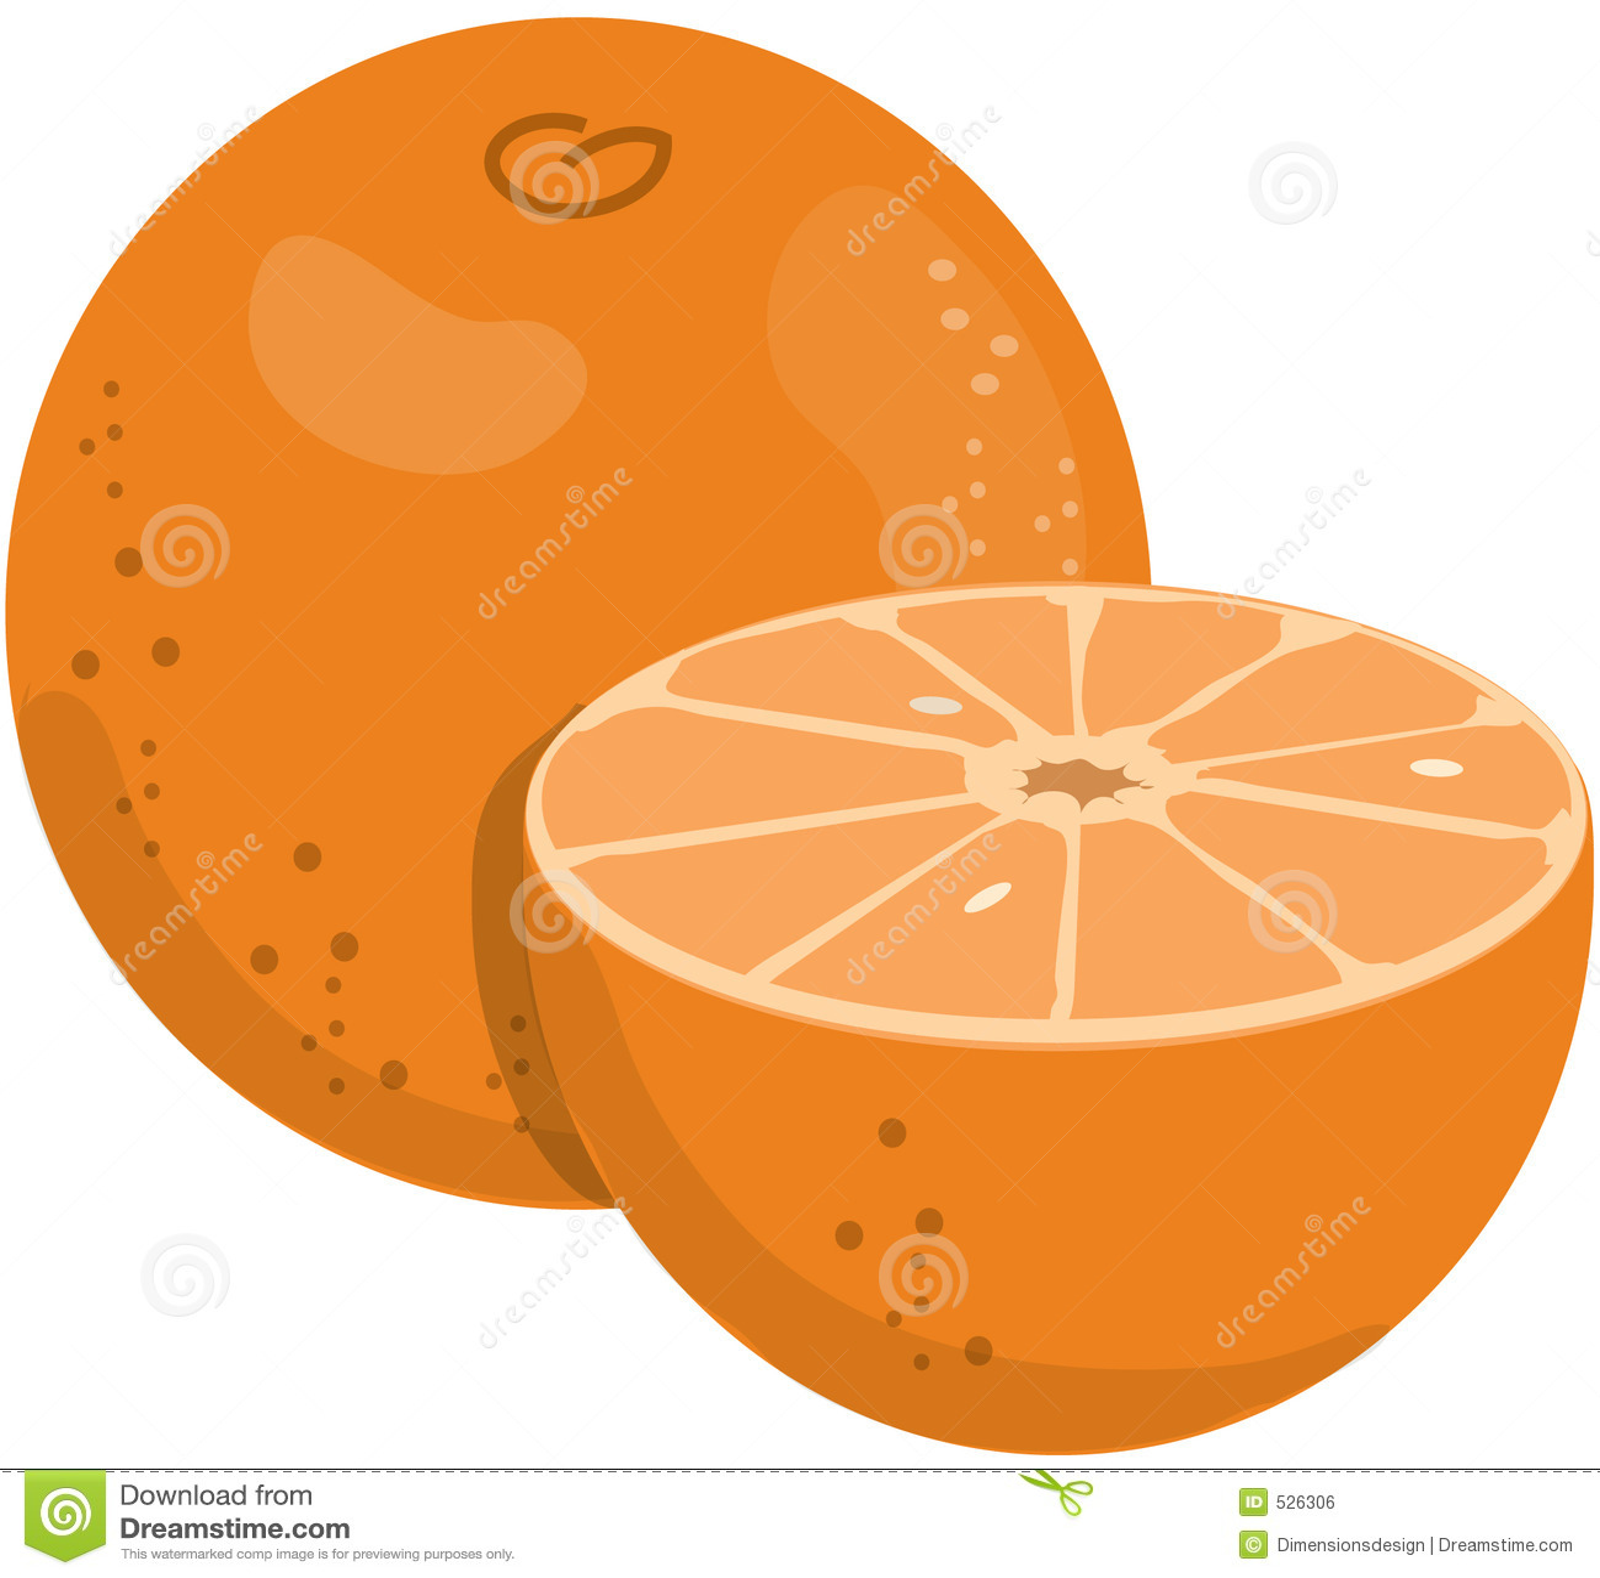 Download 桔子 库存例证. 插画 包括有 美味, 橙色, 剪切, 汁液, 空白, 对分, 许多, 点心, 果子, 食物 - 526306